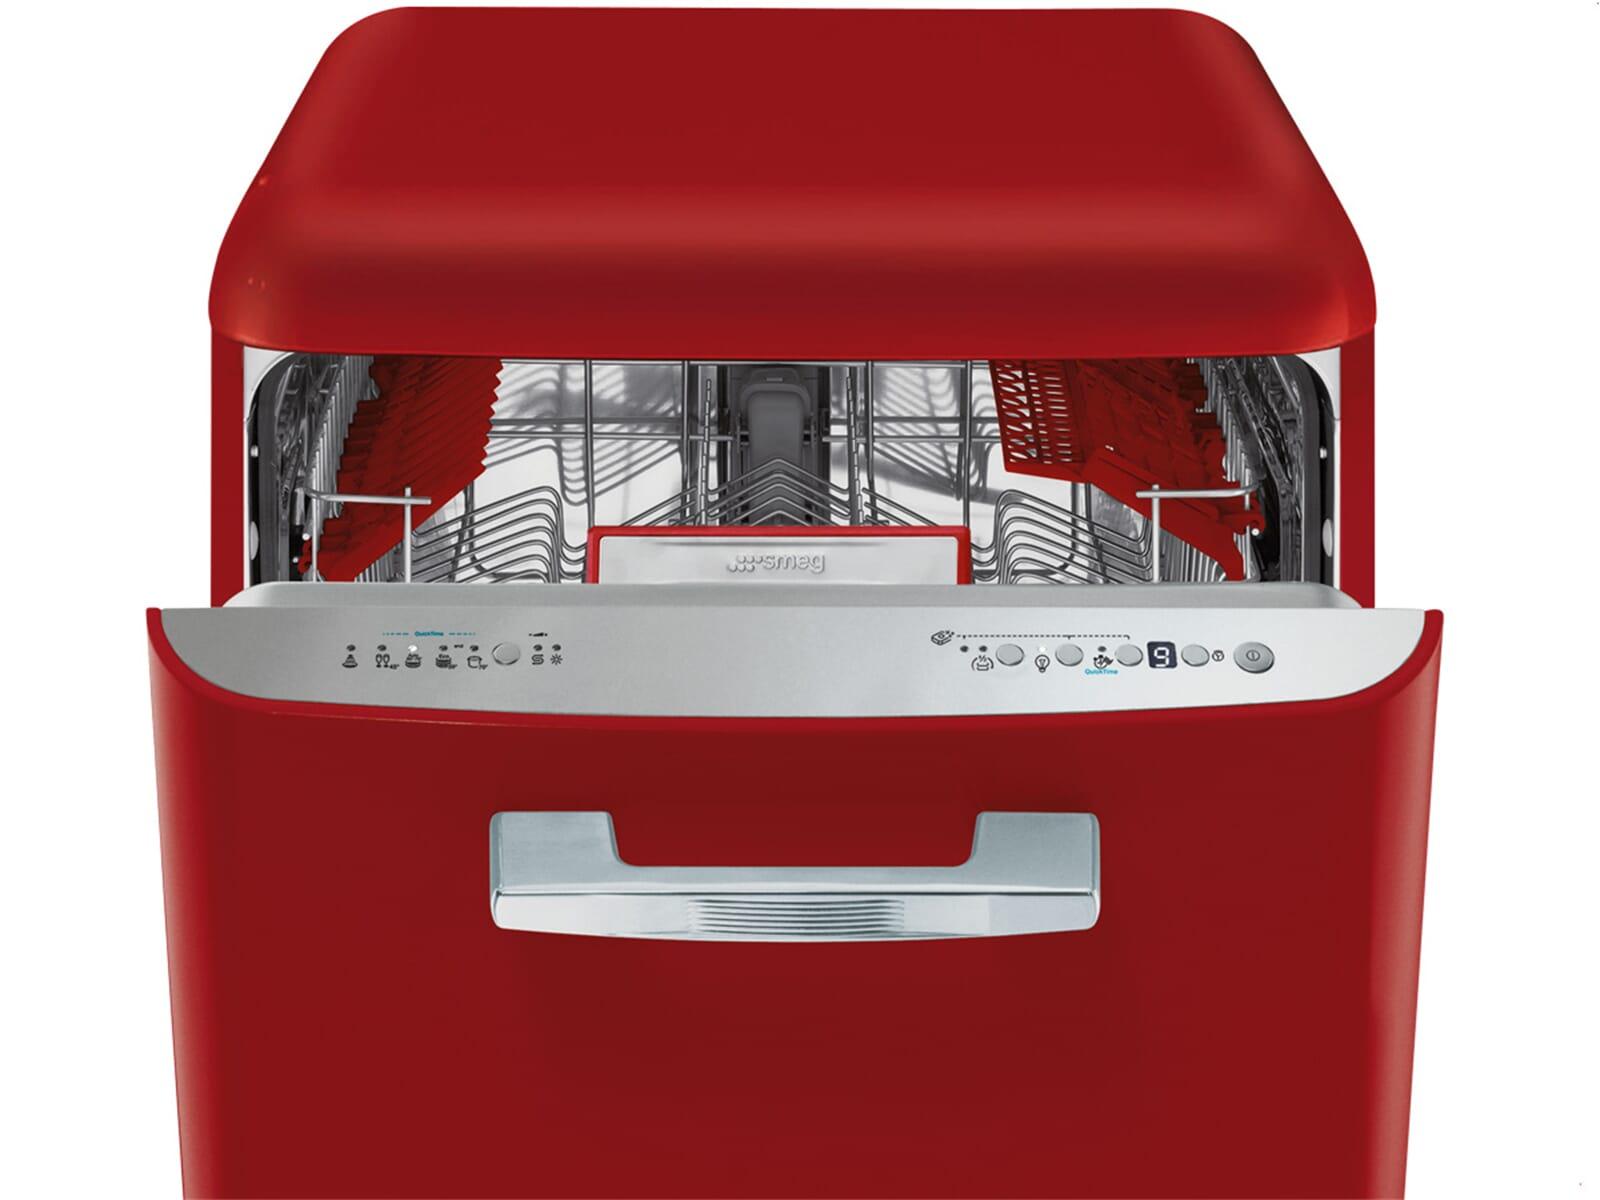 Retro Kühlschrank Creme : Smeg kühlschrank creme gebraucht sal touristik